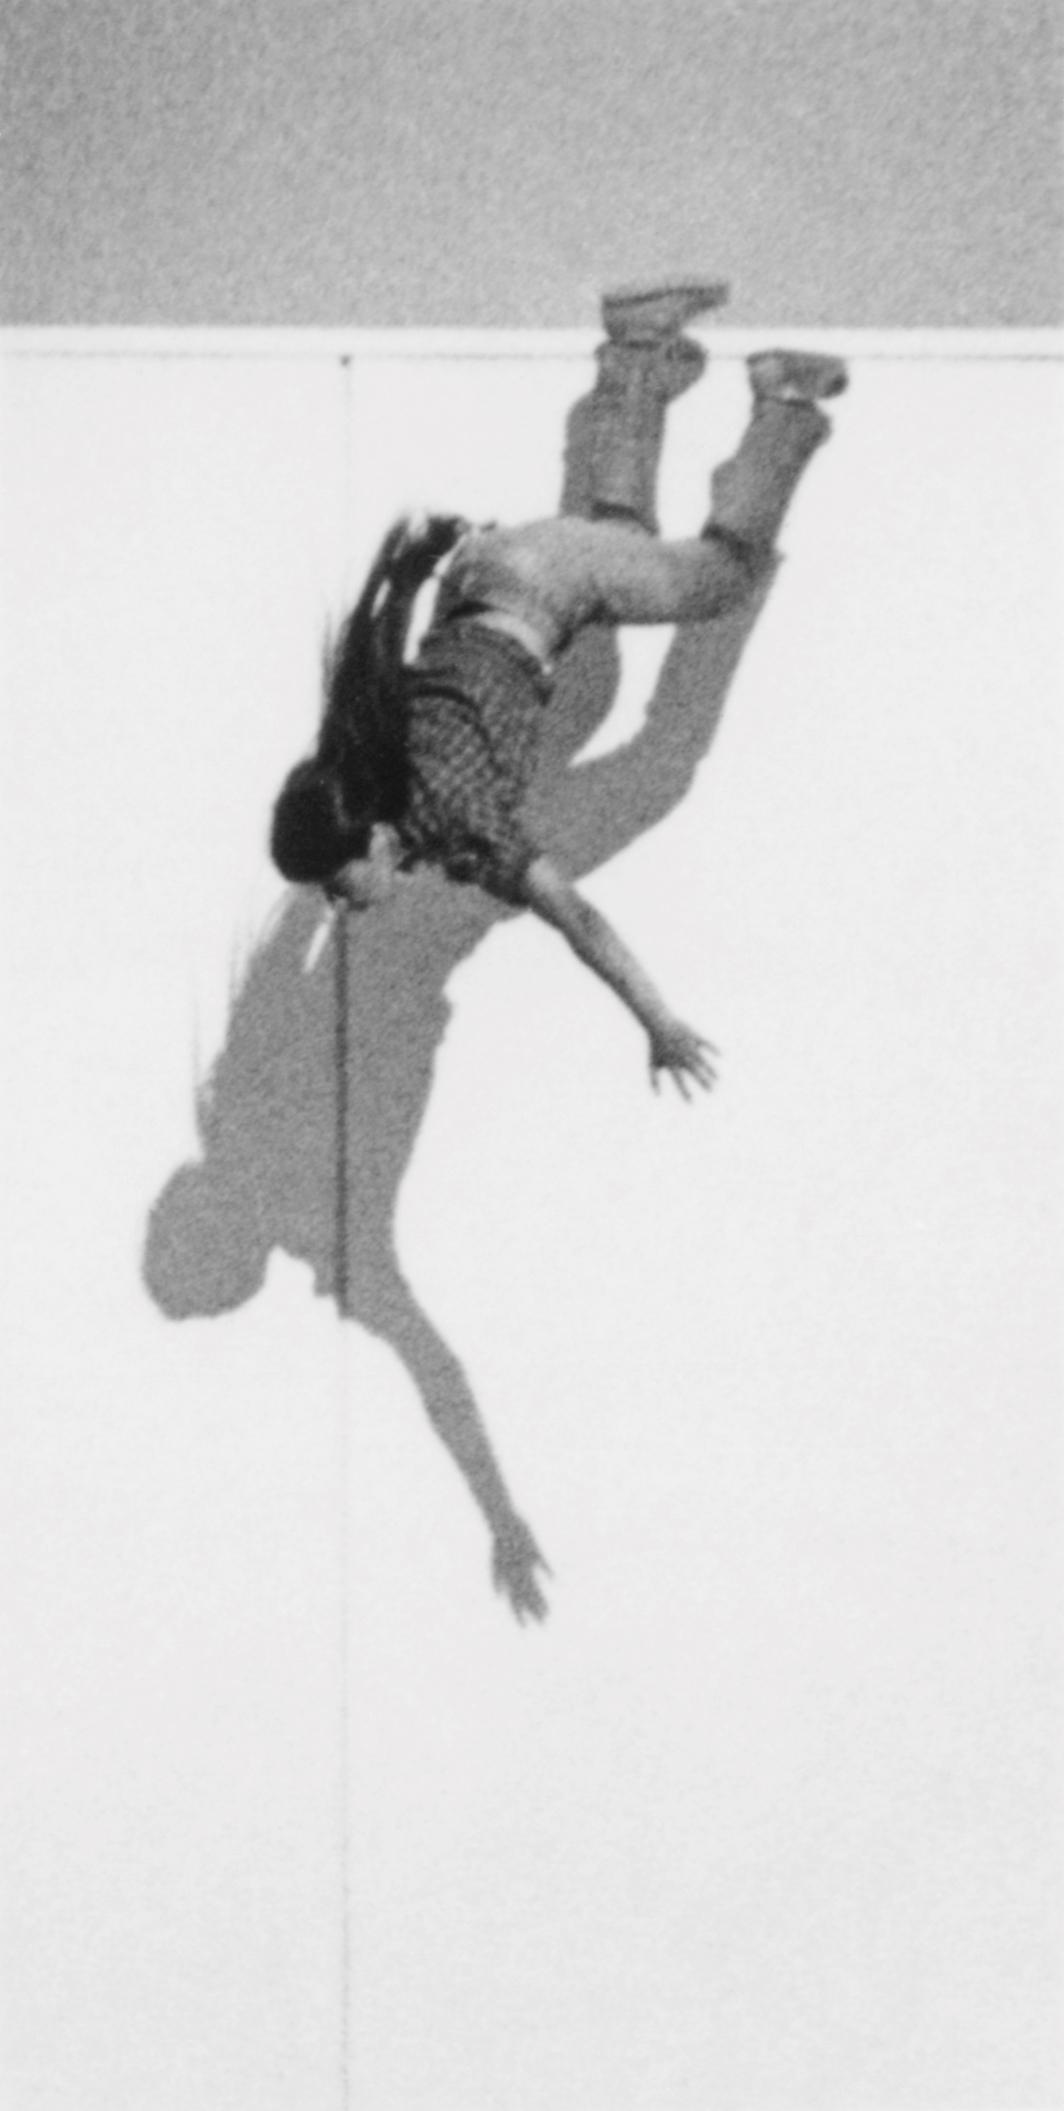 Sarah Charlesworth, Patricia Cawlings, Los Angeles, 1980, gelatin silver print, 78 × 42